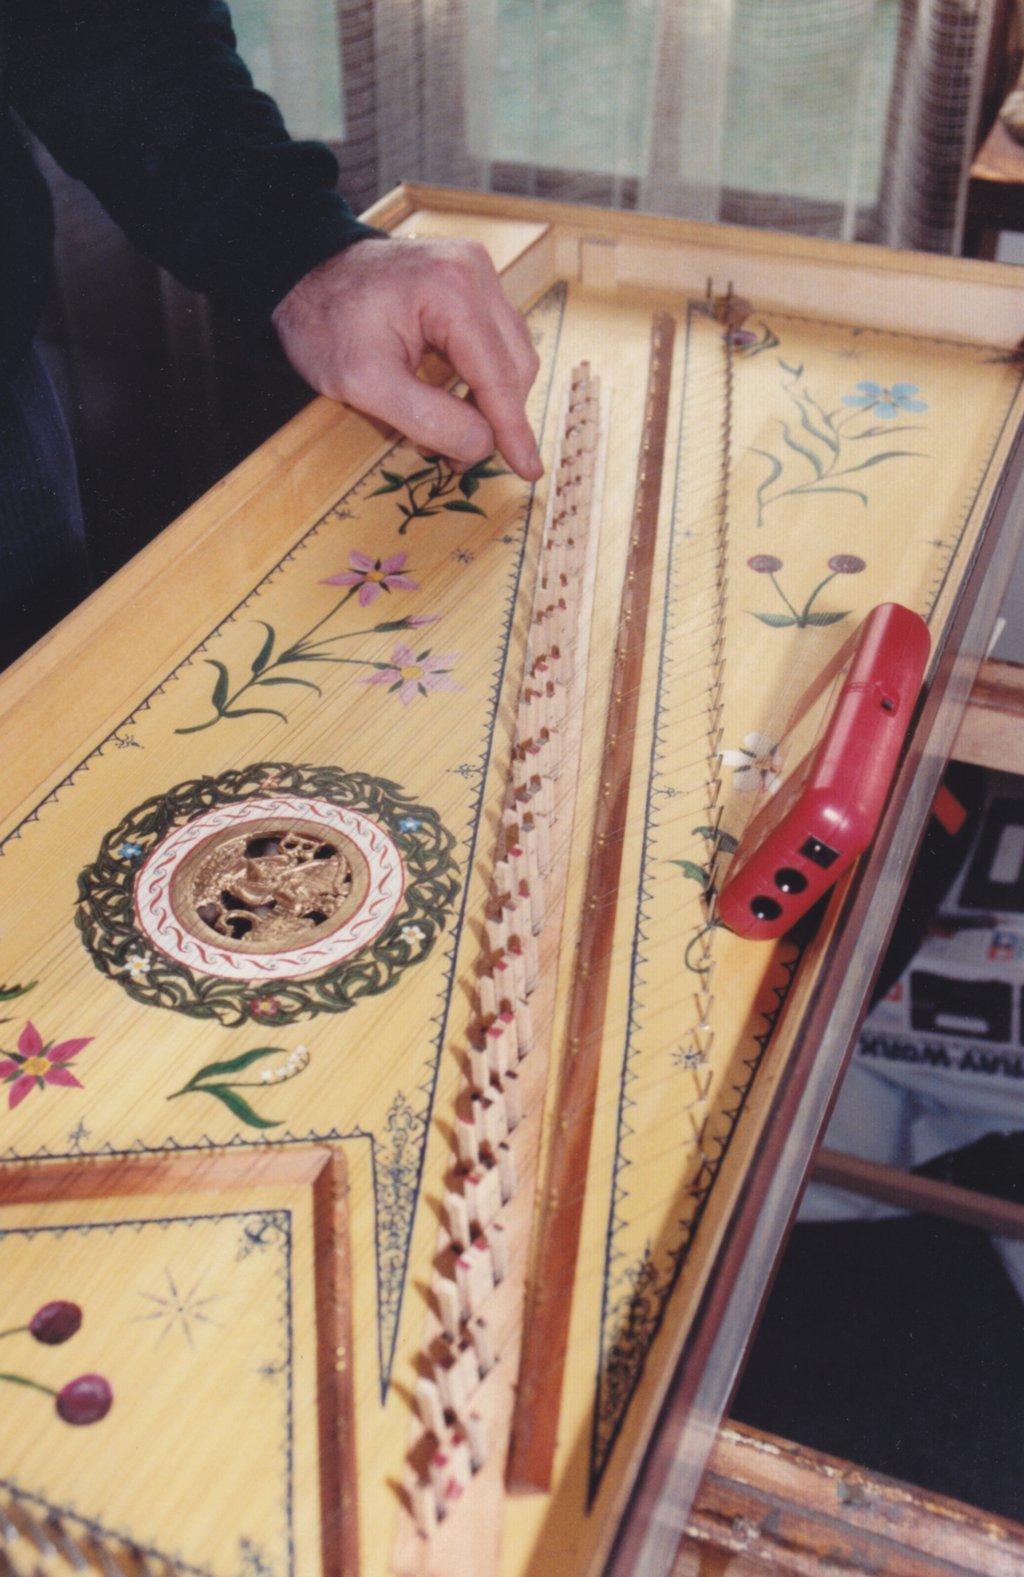 Fabrication d'instruments de musique anciens de bgire - Page 2 RmNjJb-1992-Kind-Virginal-68